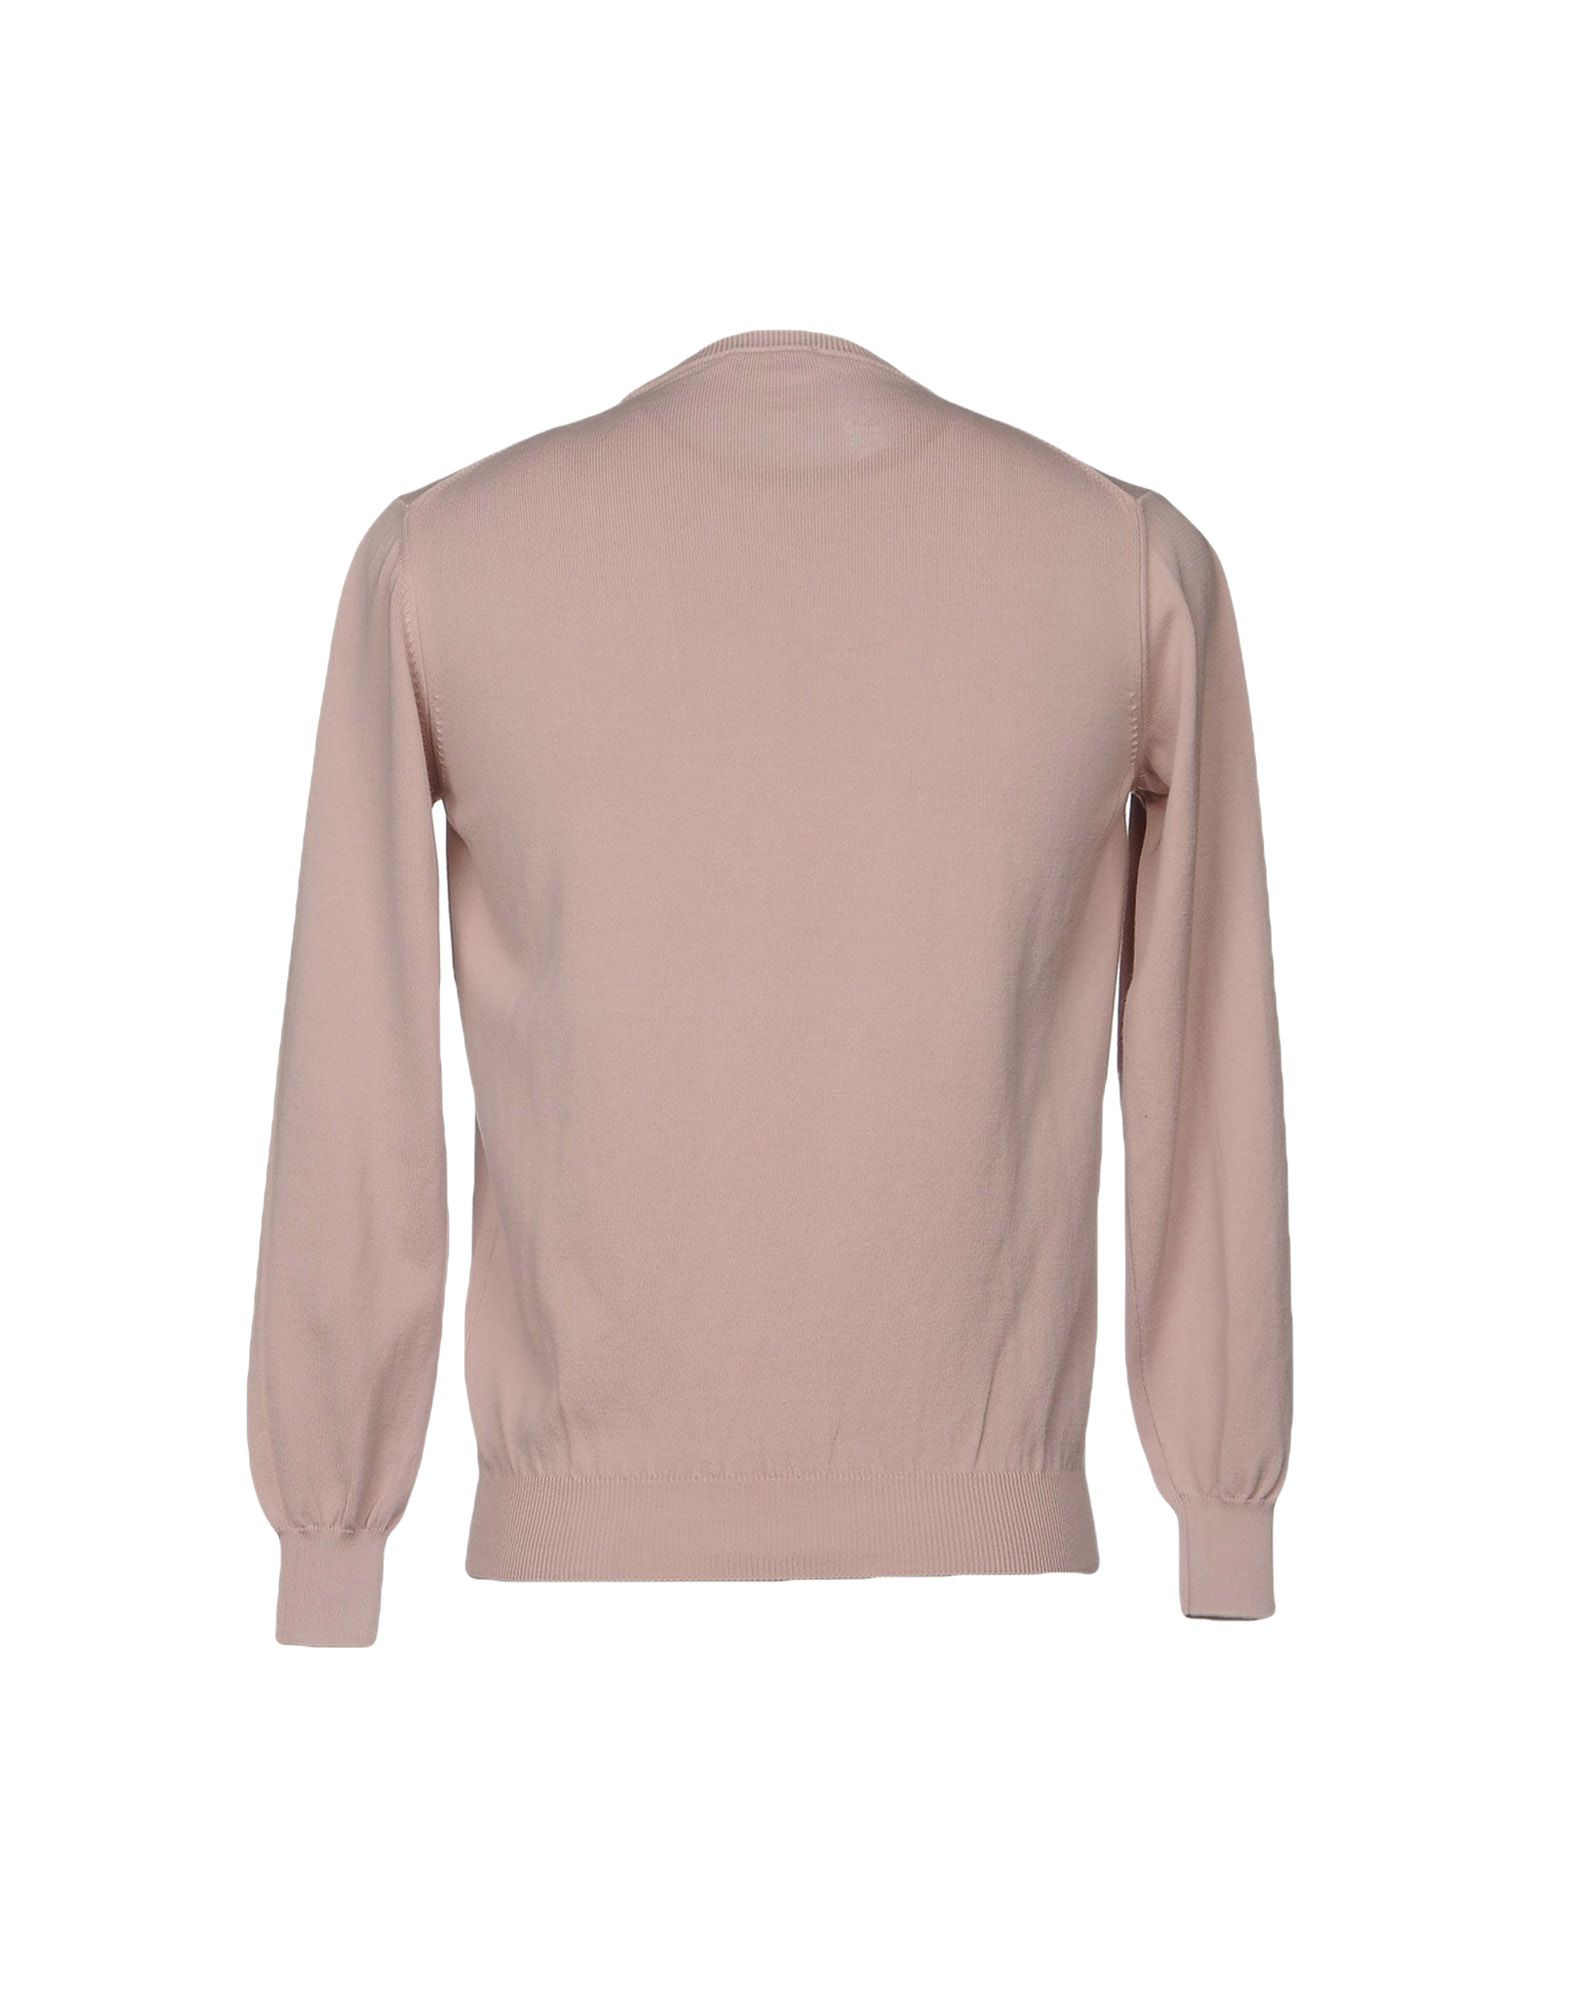 ФОТО rossopuro свитер